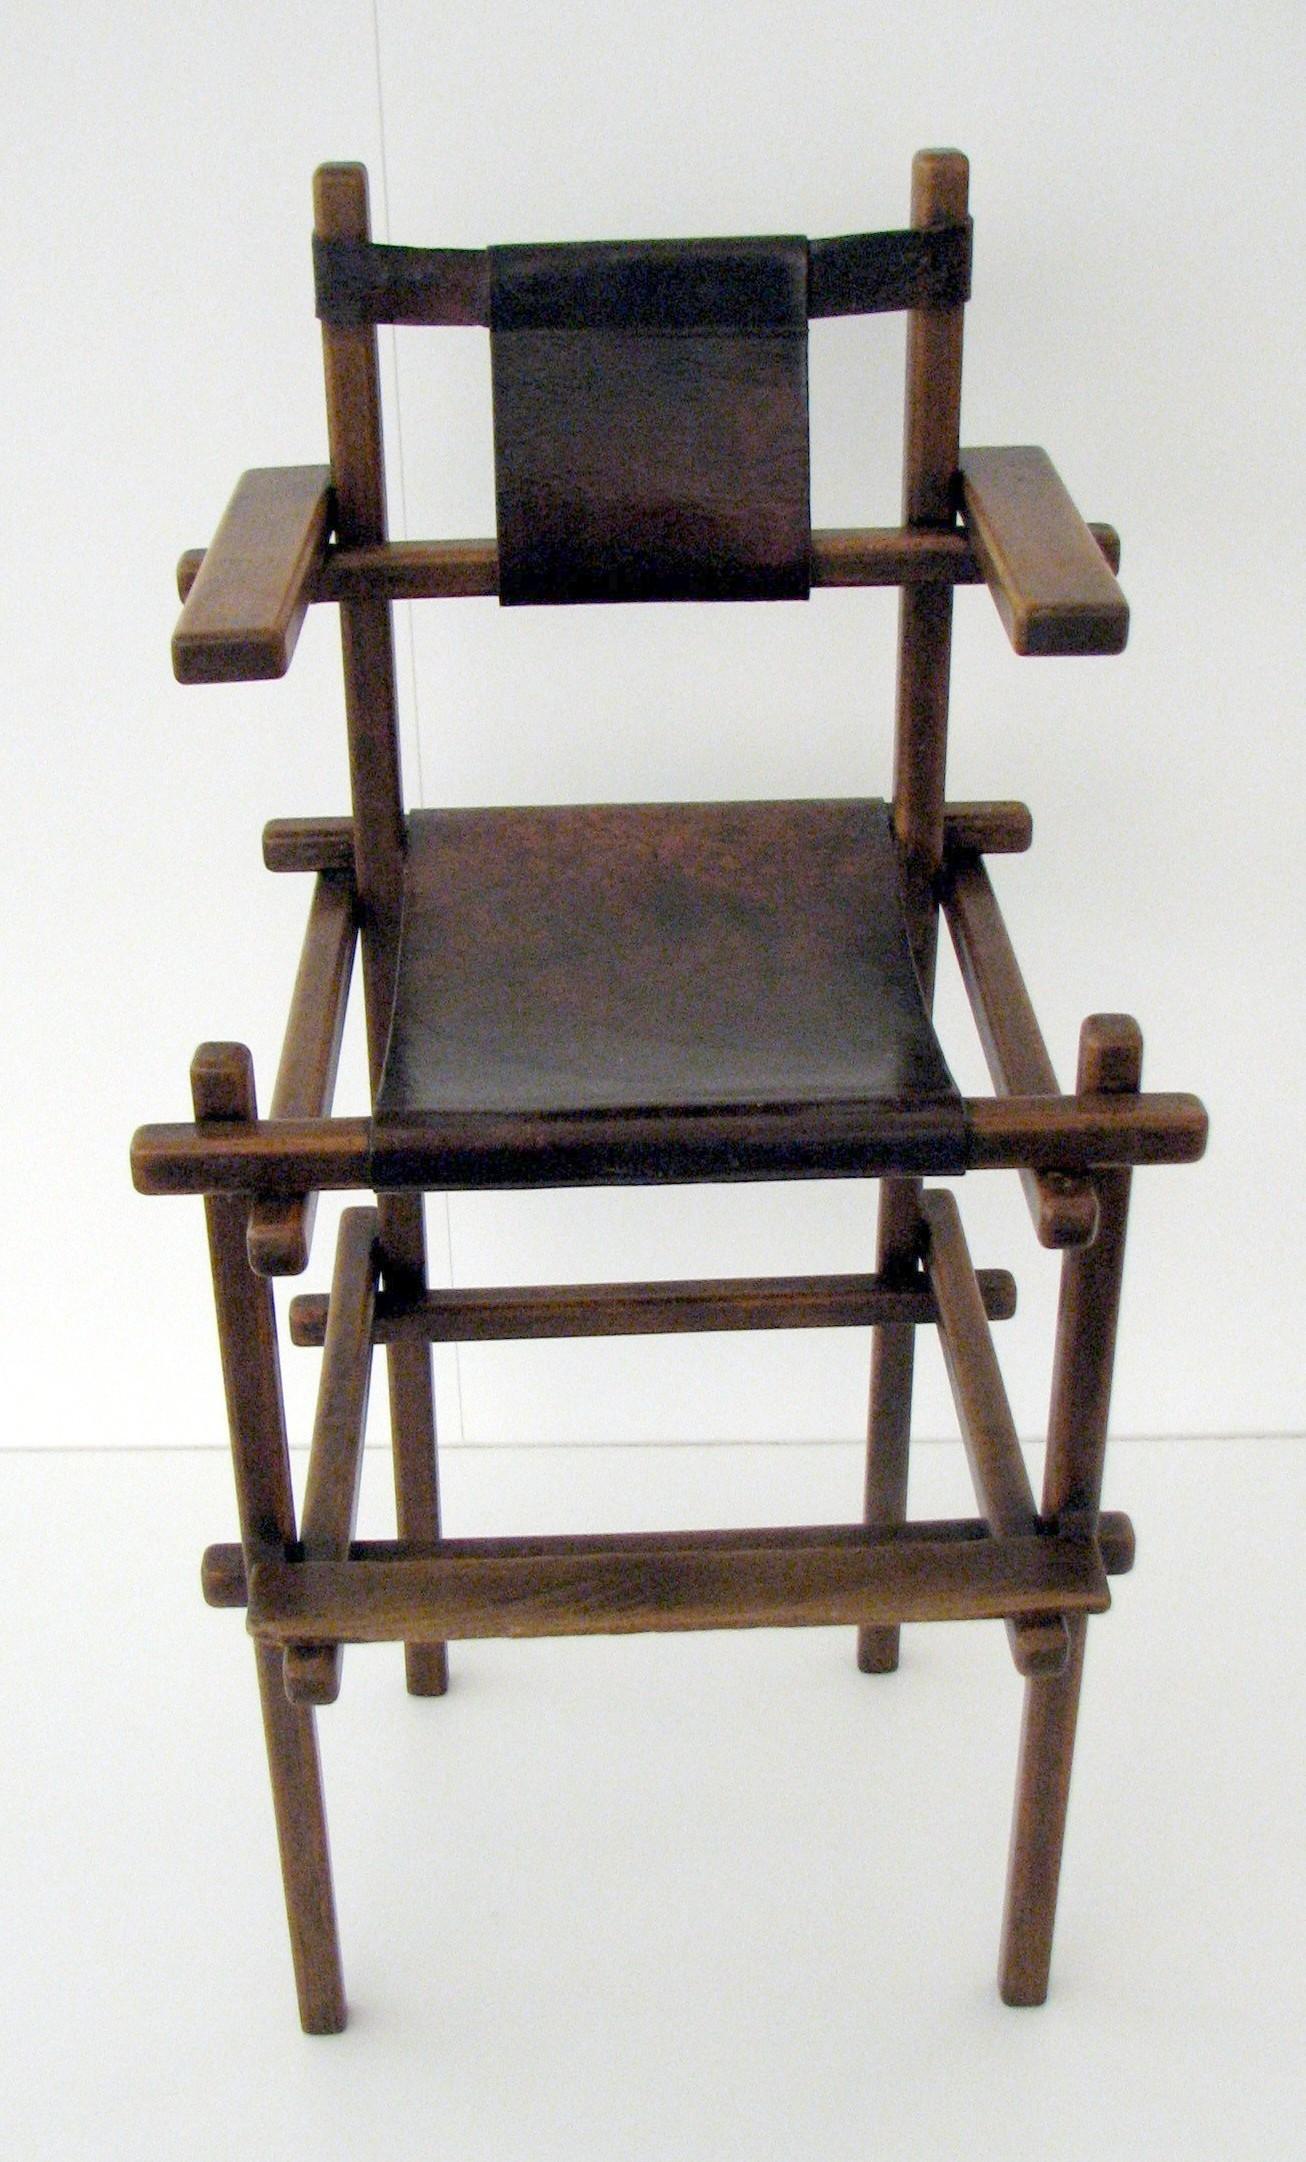 Gerrit Rietveld Kinderstoel